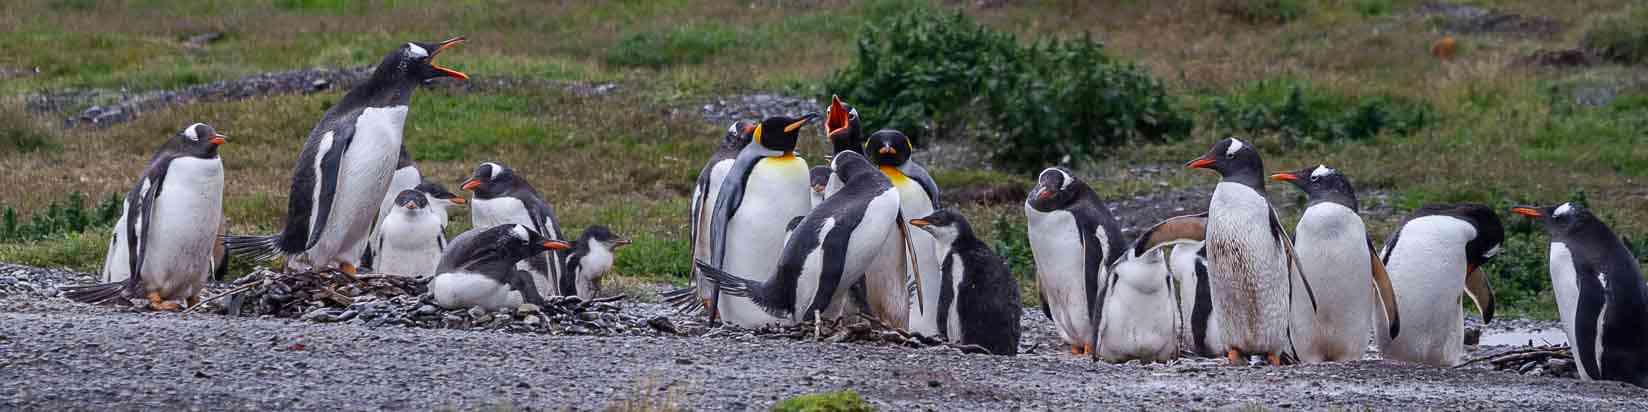 Gentoo Penguin  Birdnig in Ushuaia